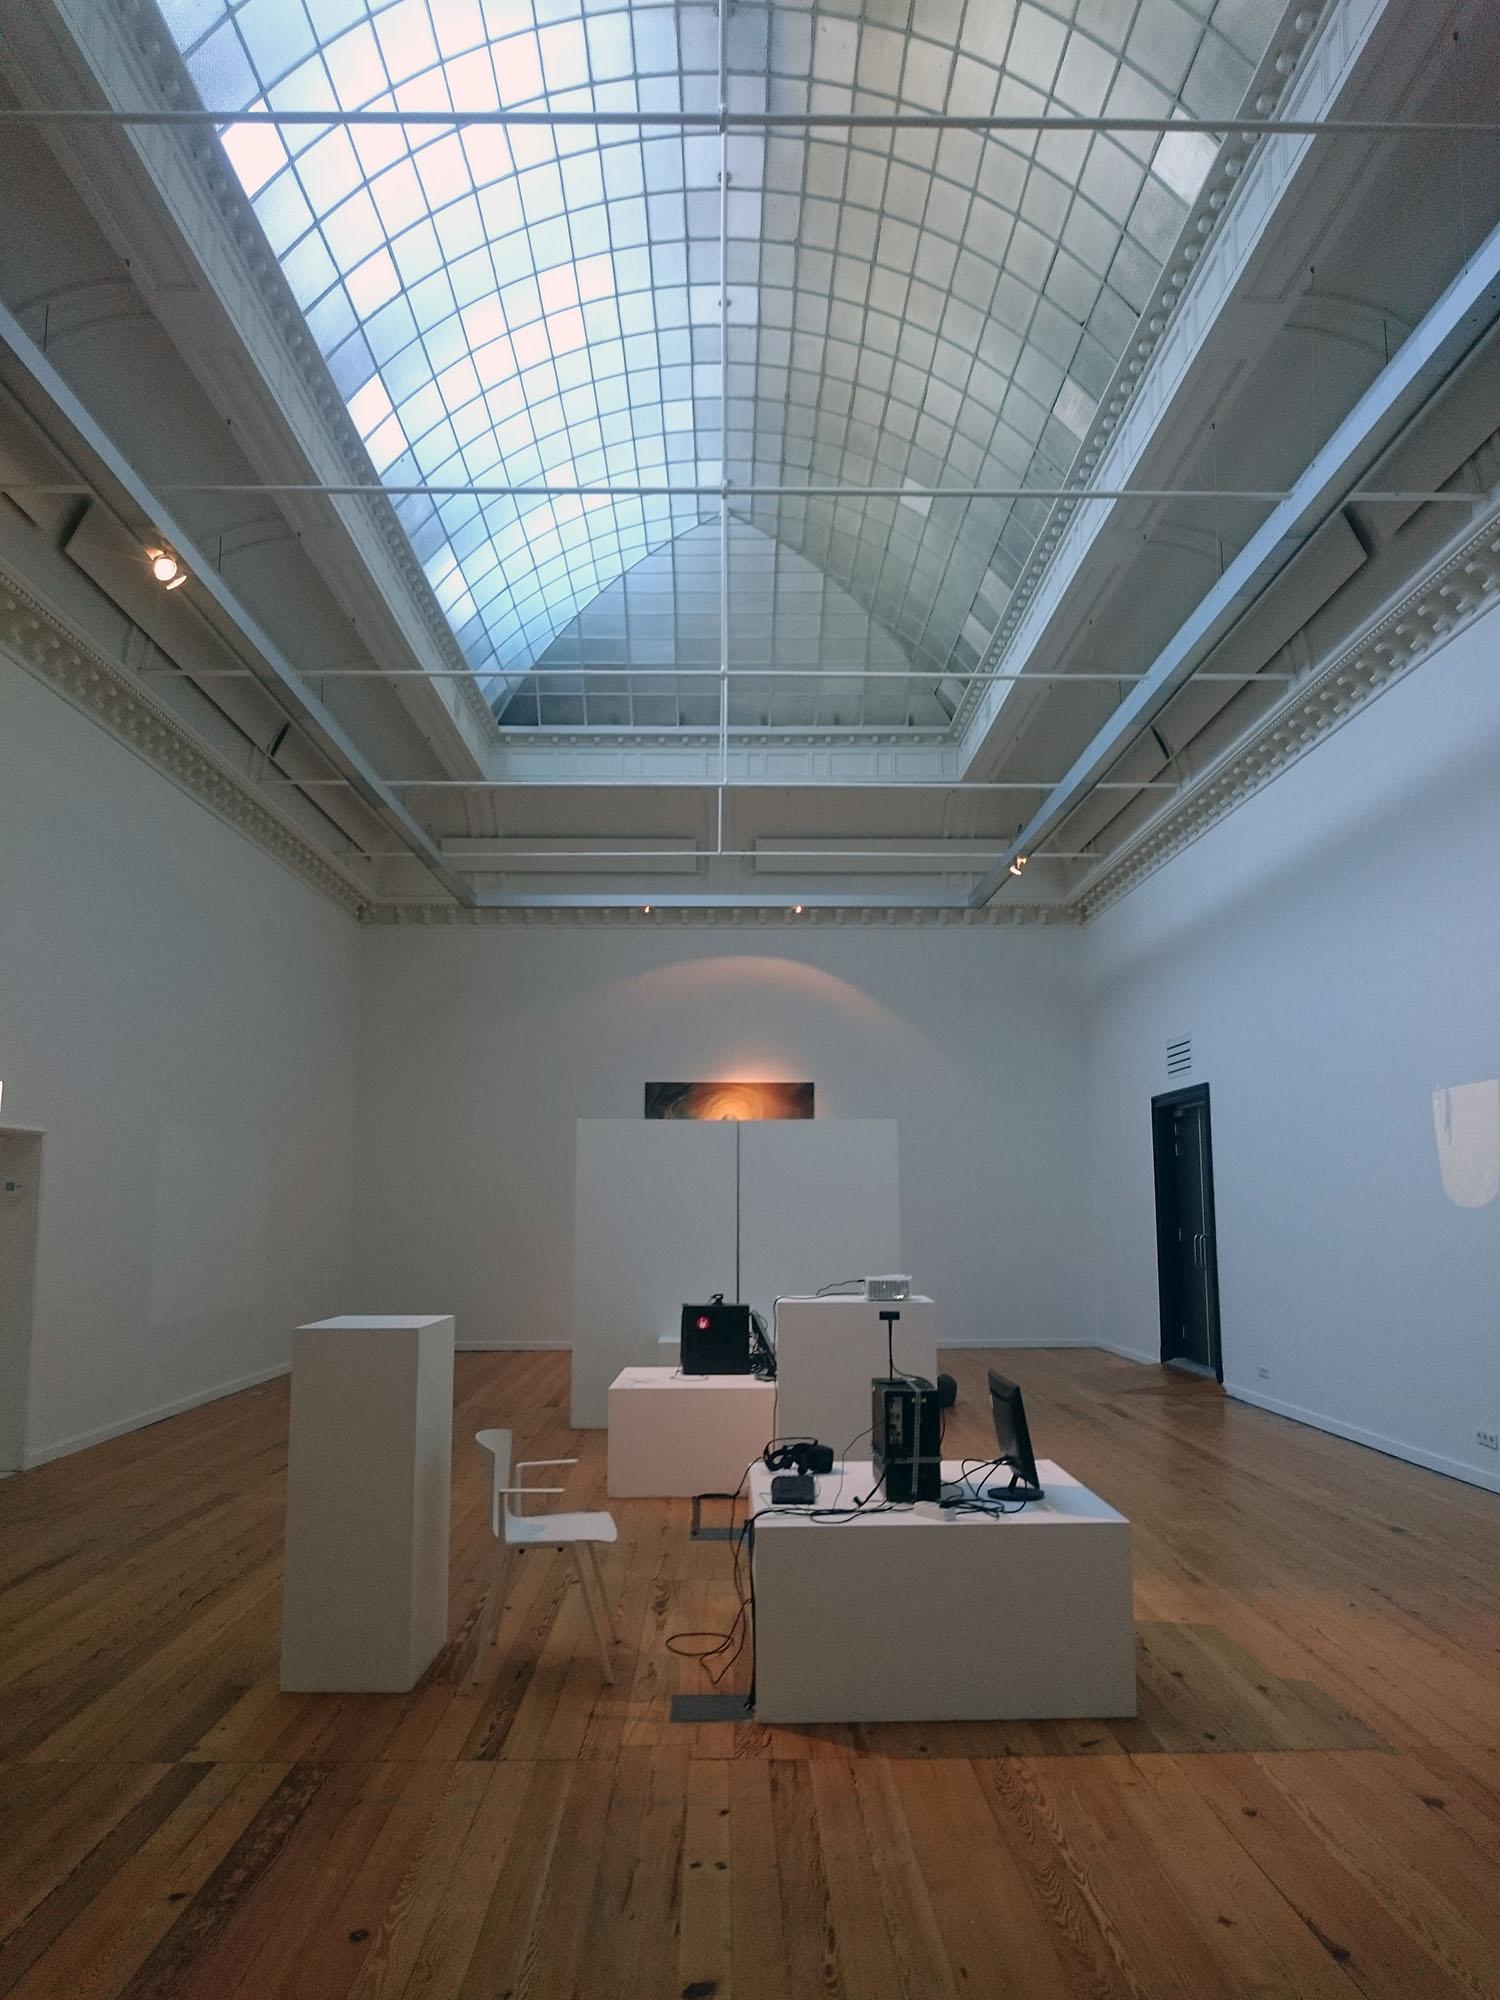 DSC 0064 Curatorial